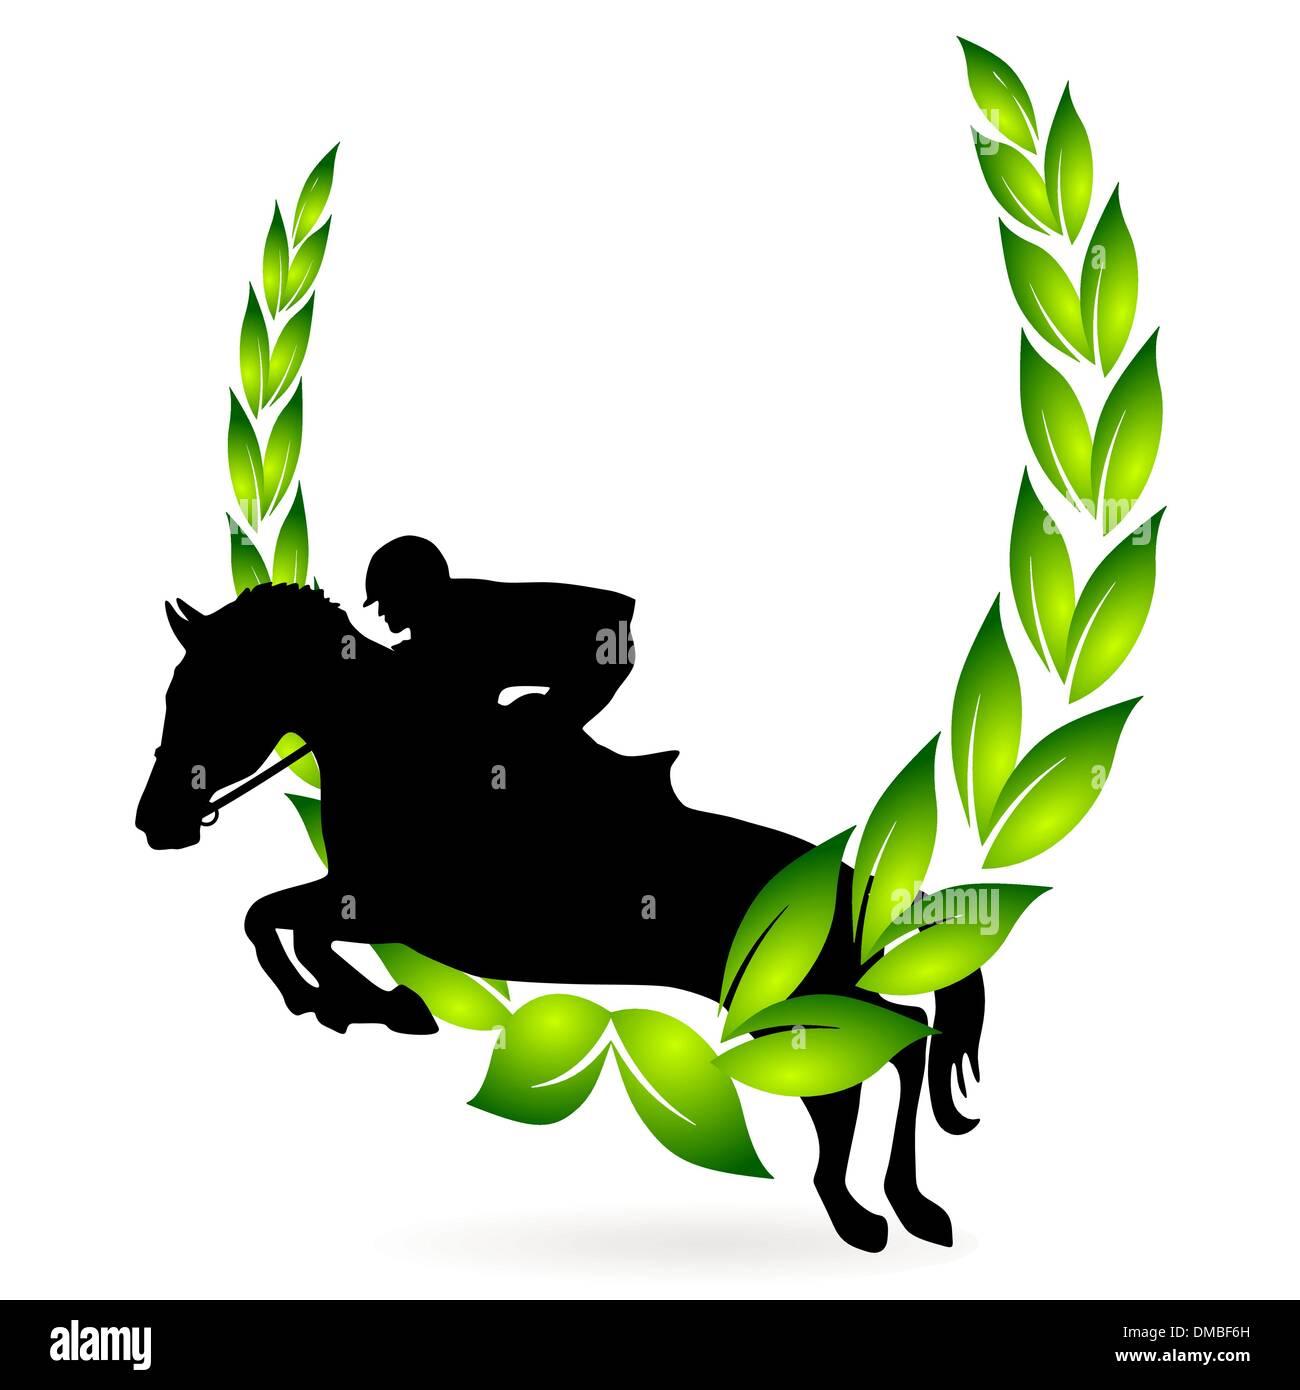 show jumping award - Stock Image